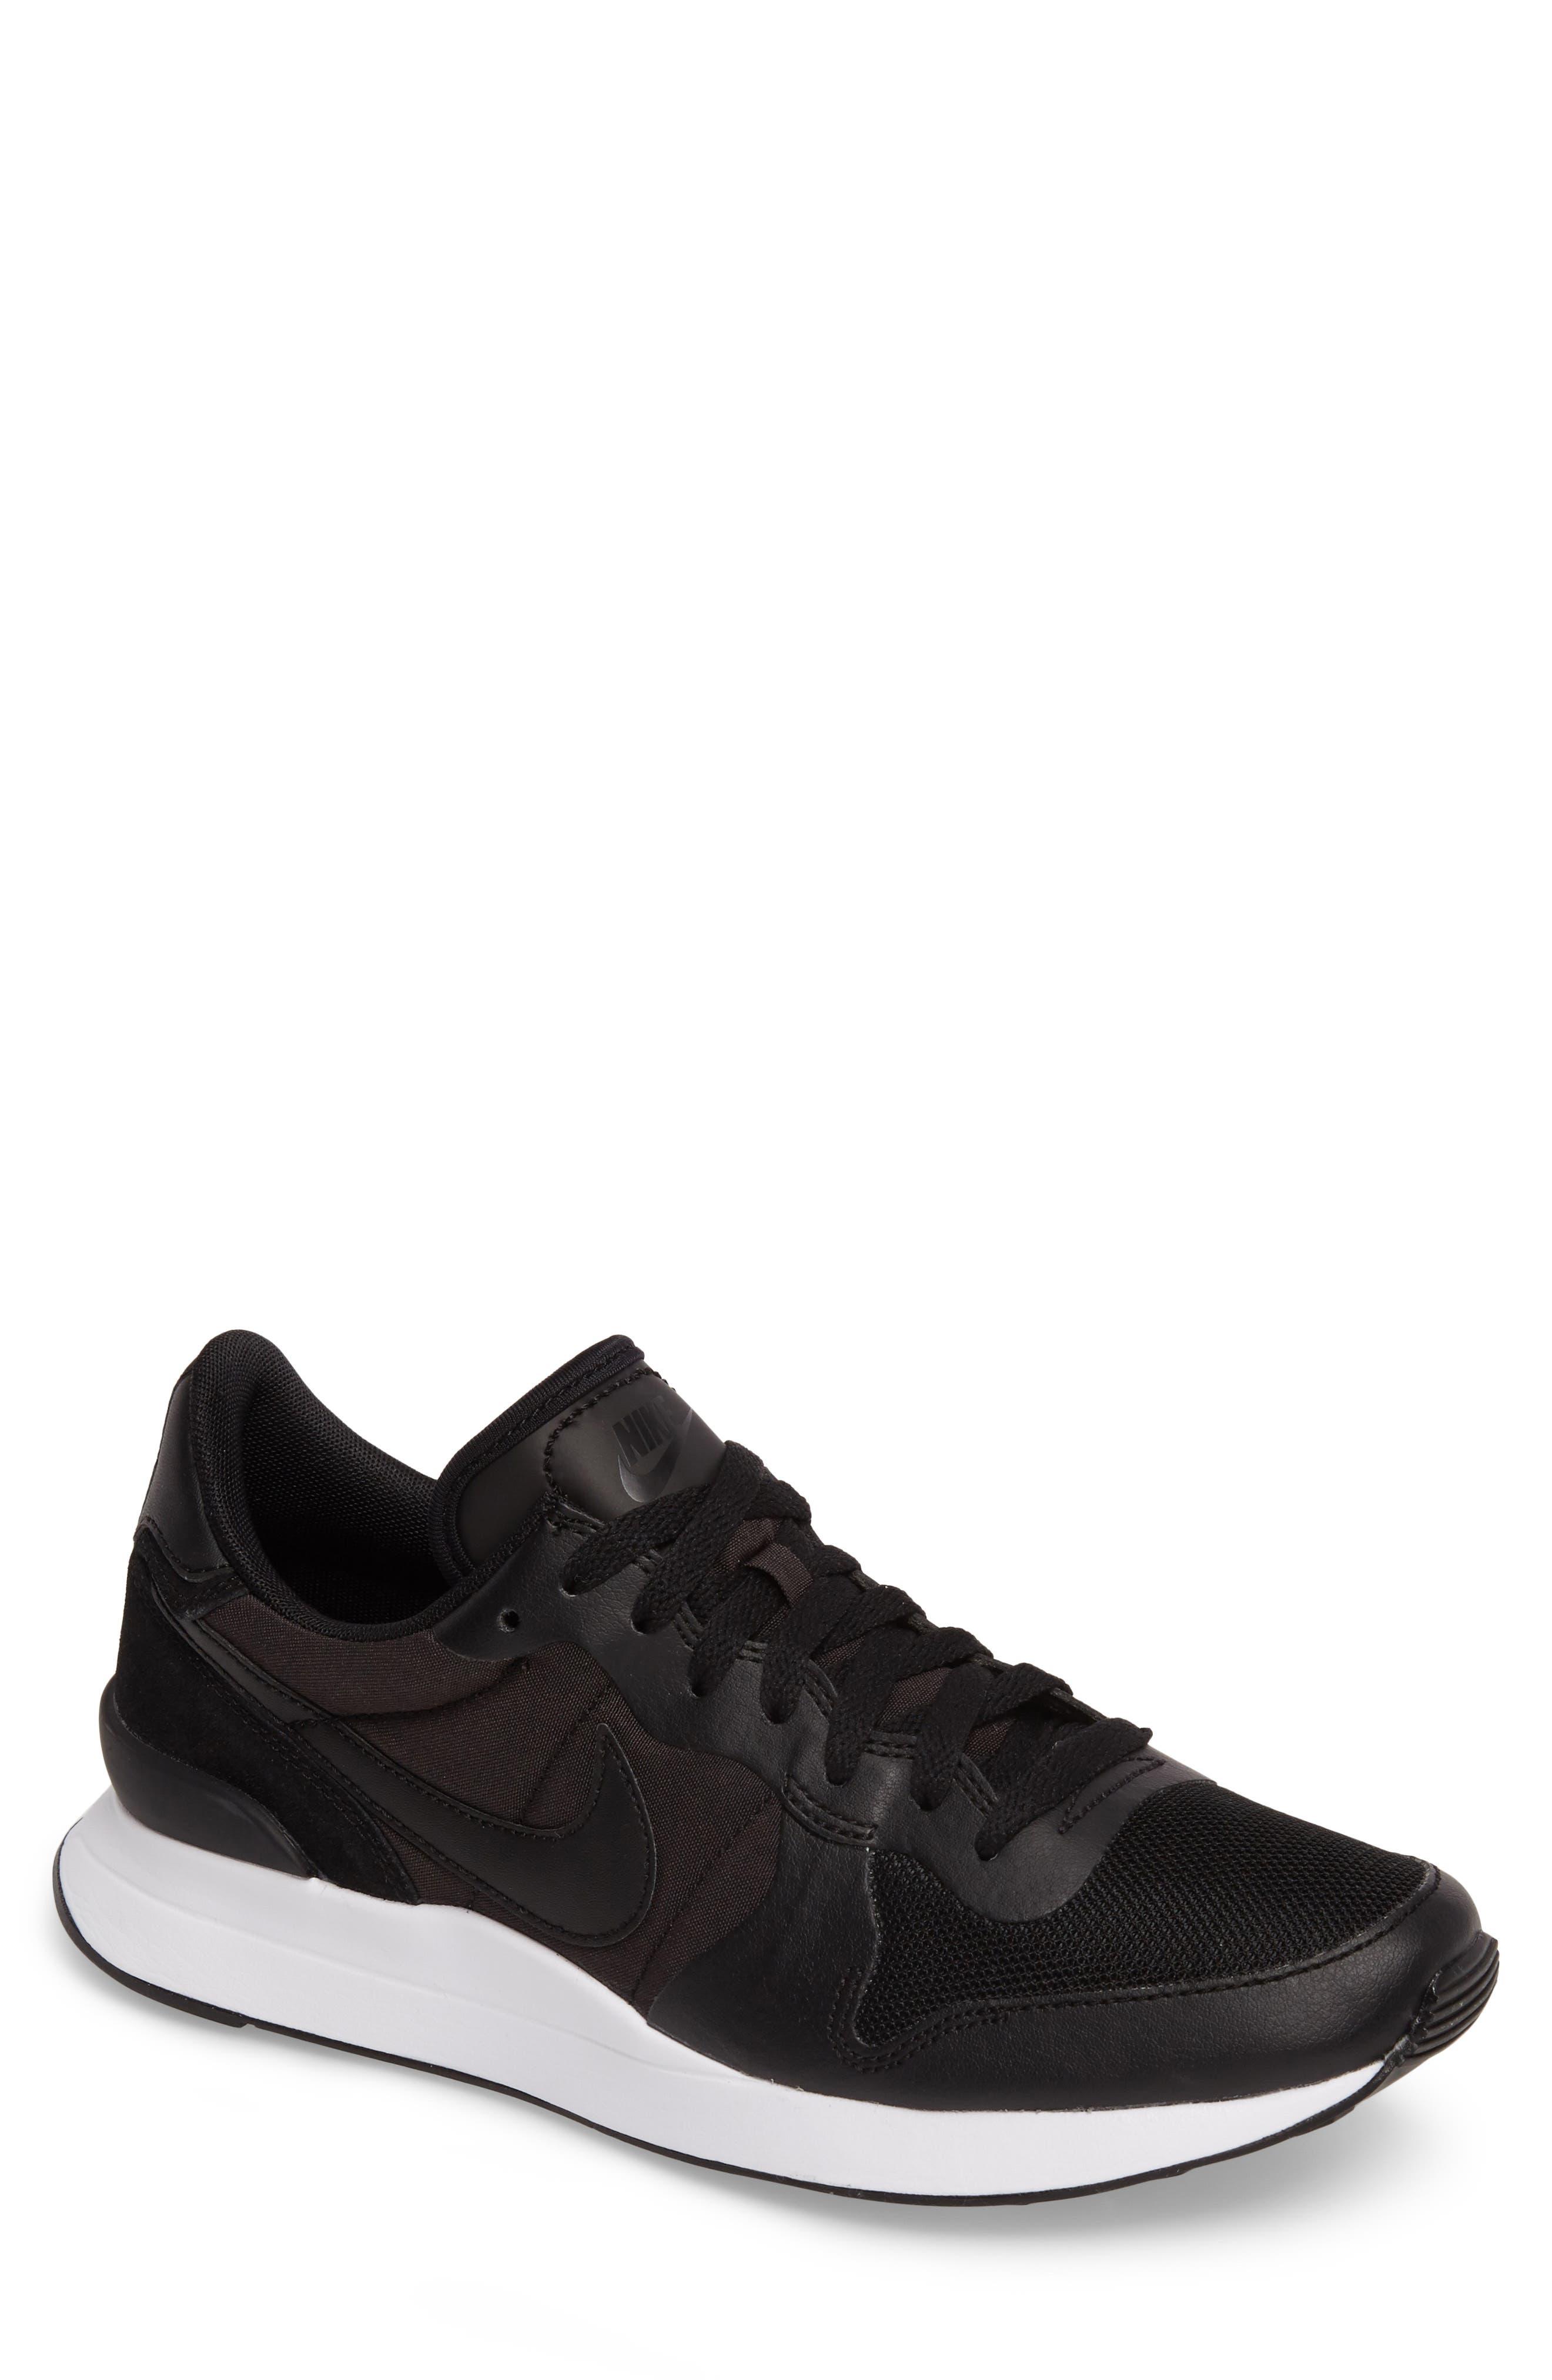 Internationalist LT17 Sneaker,                             Main thumbnail 1, color,